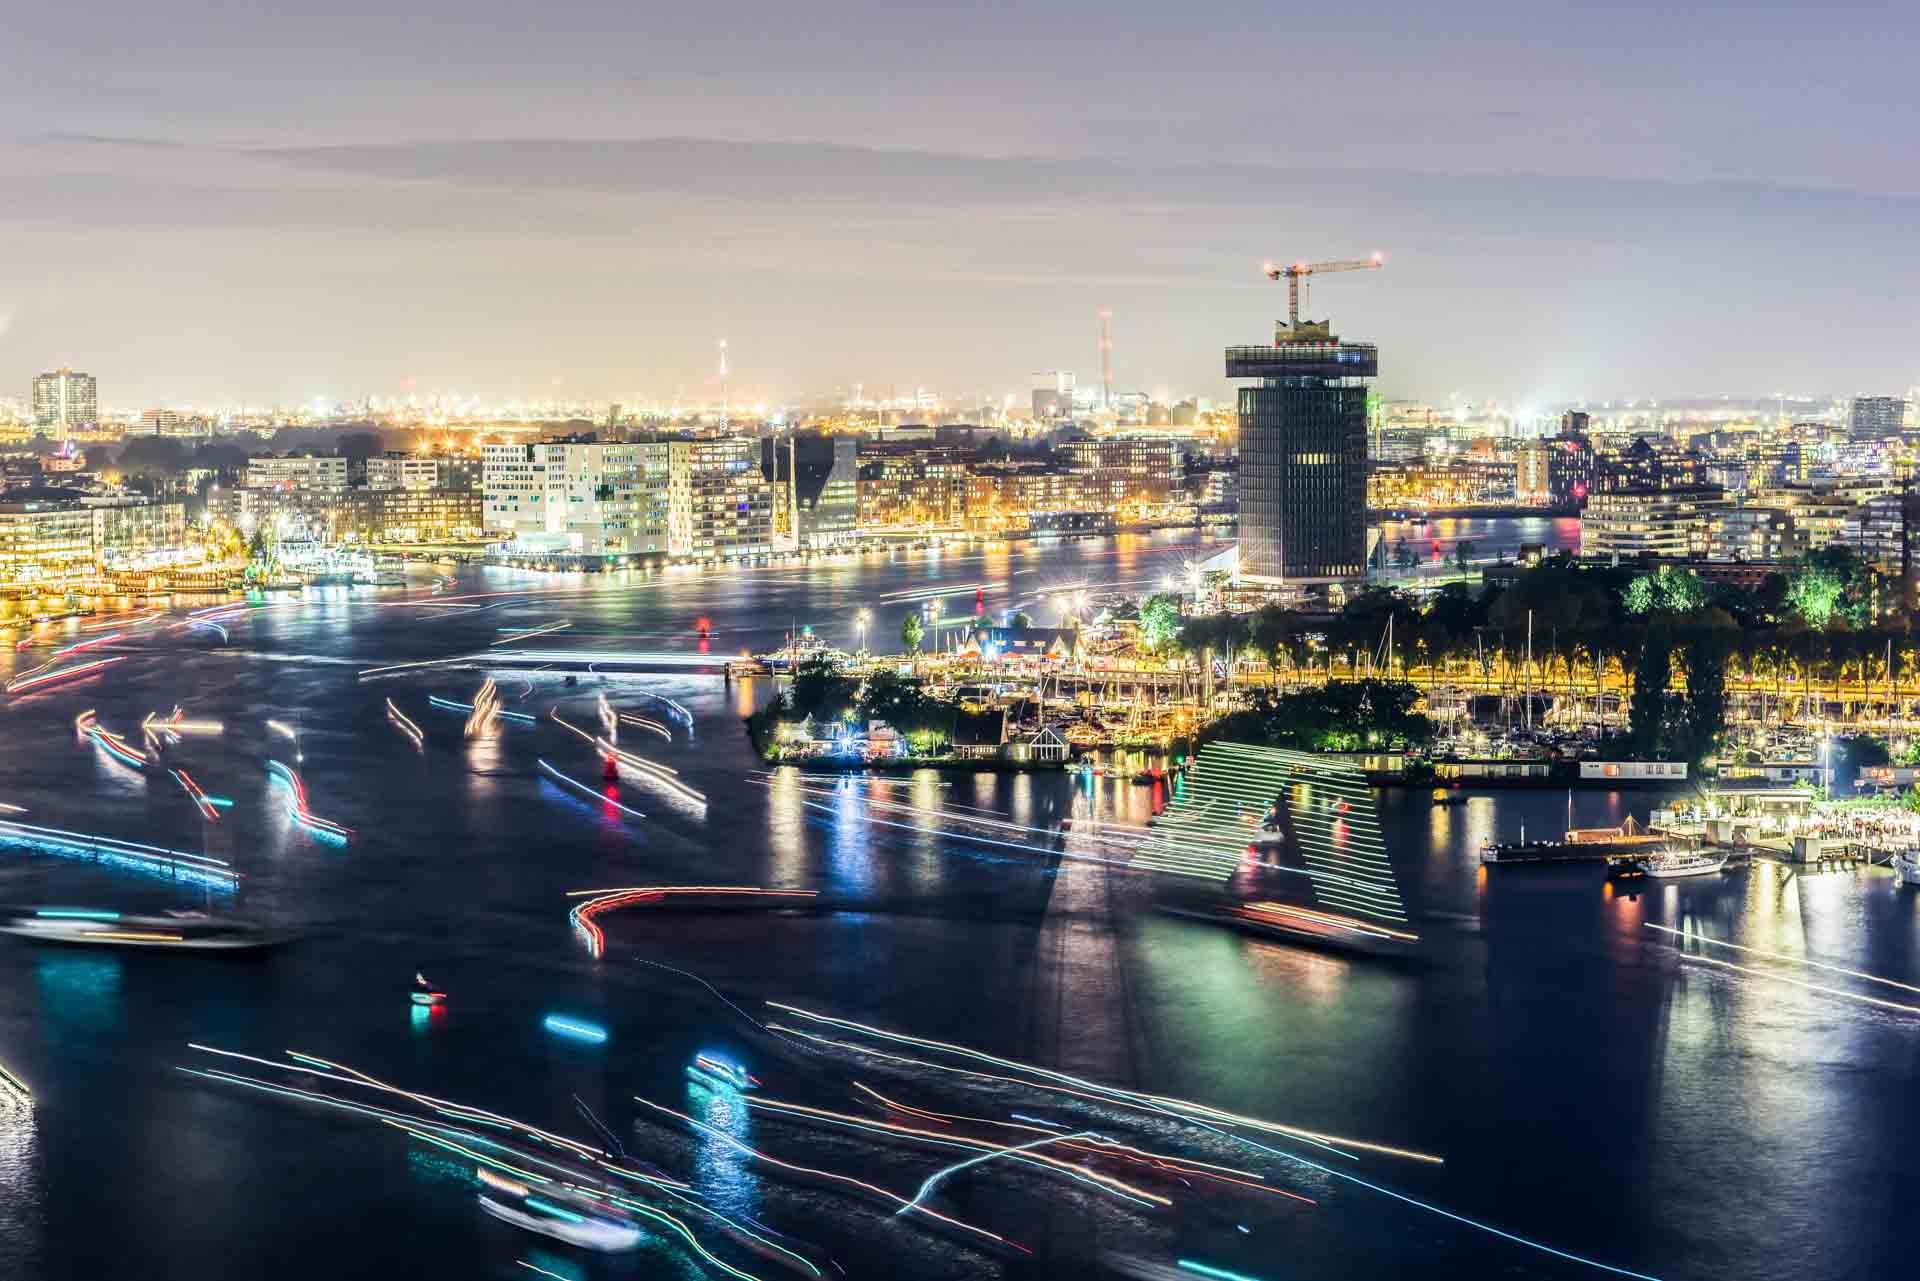 Nachtelijk Amsterdam, avondfotografie Amsterdam, avondfoto's Amsterdam, nachtfotografie Amsterdam, A'DAM Toren, Het IJ, SAIL Amsterdam 2015